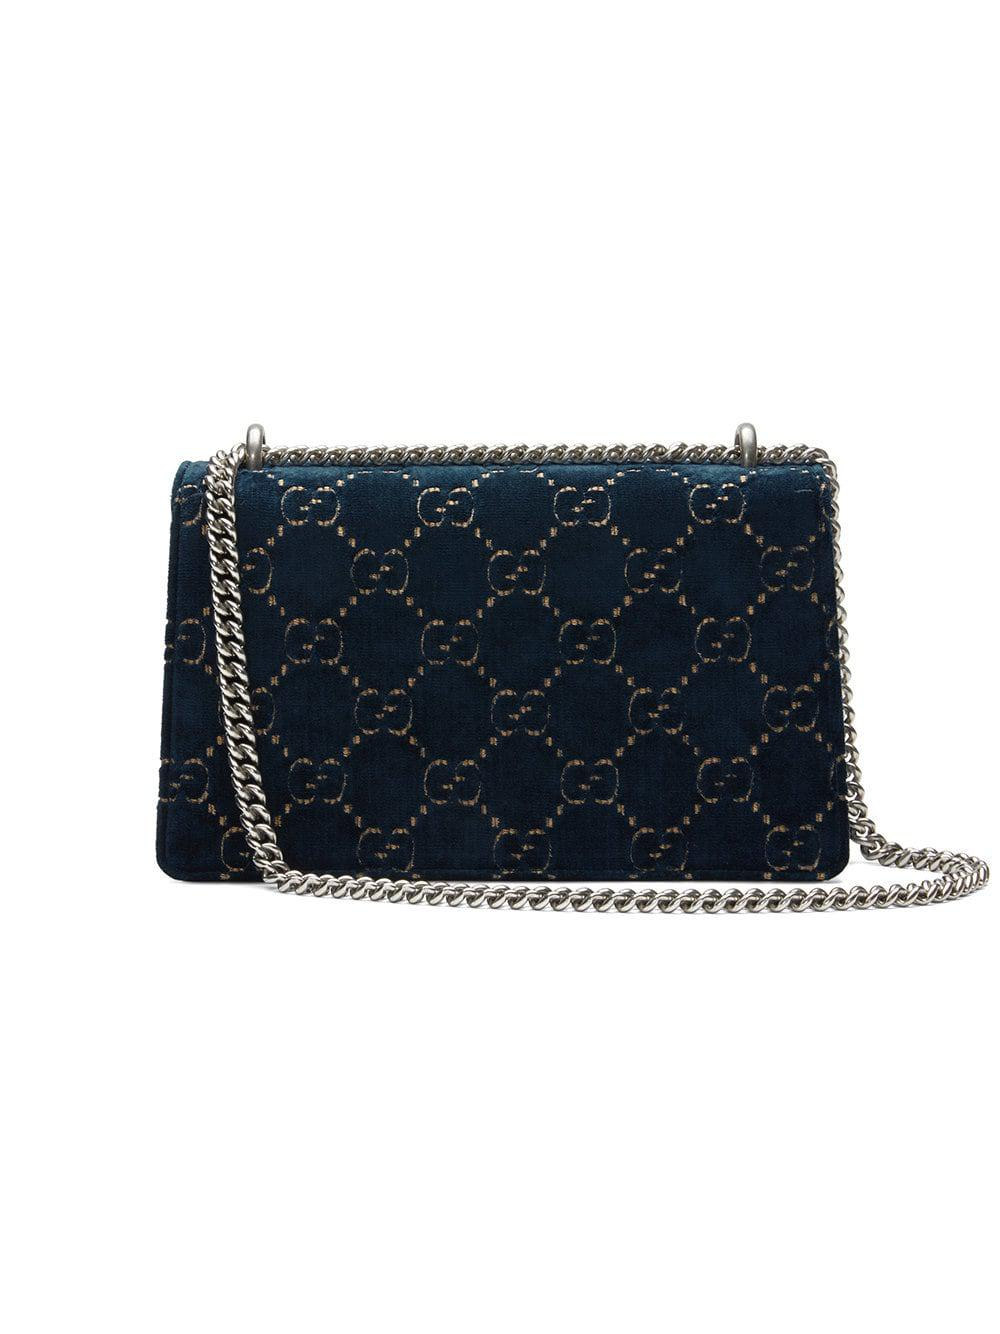 5b6358f4a853 Lyst - Gucci Dionysus GG Velvet Small Shoulder Bag in Black